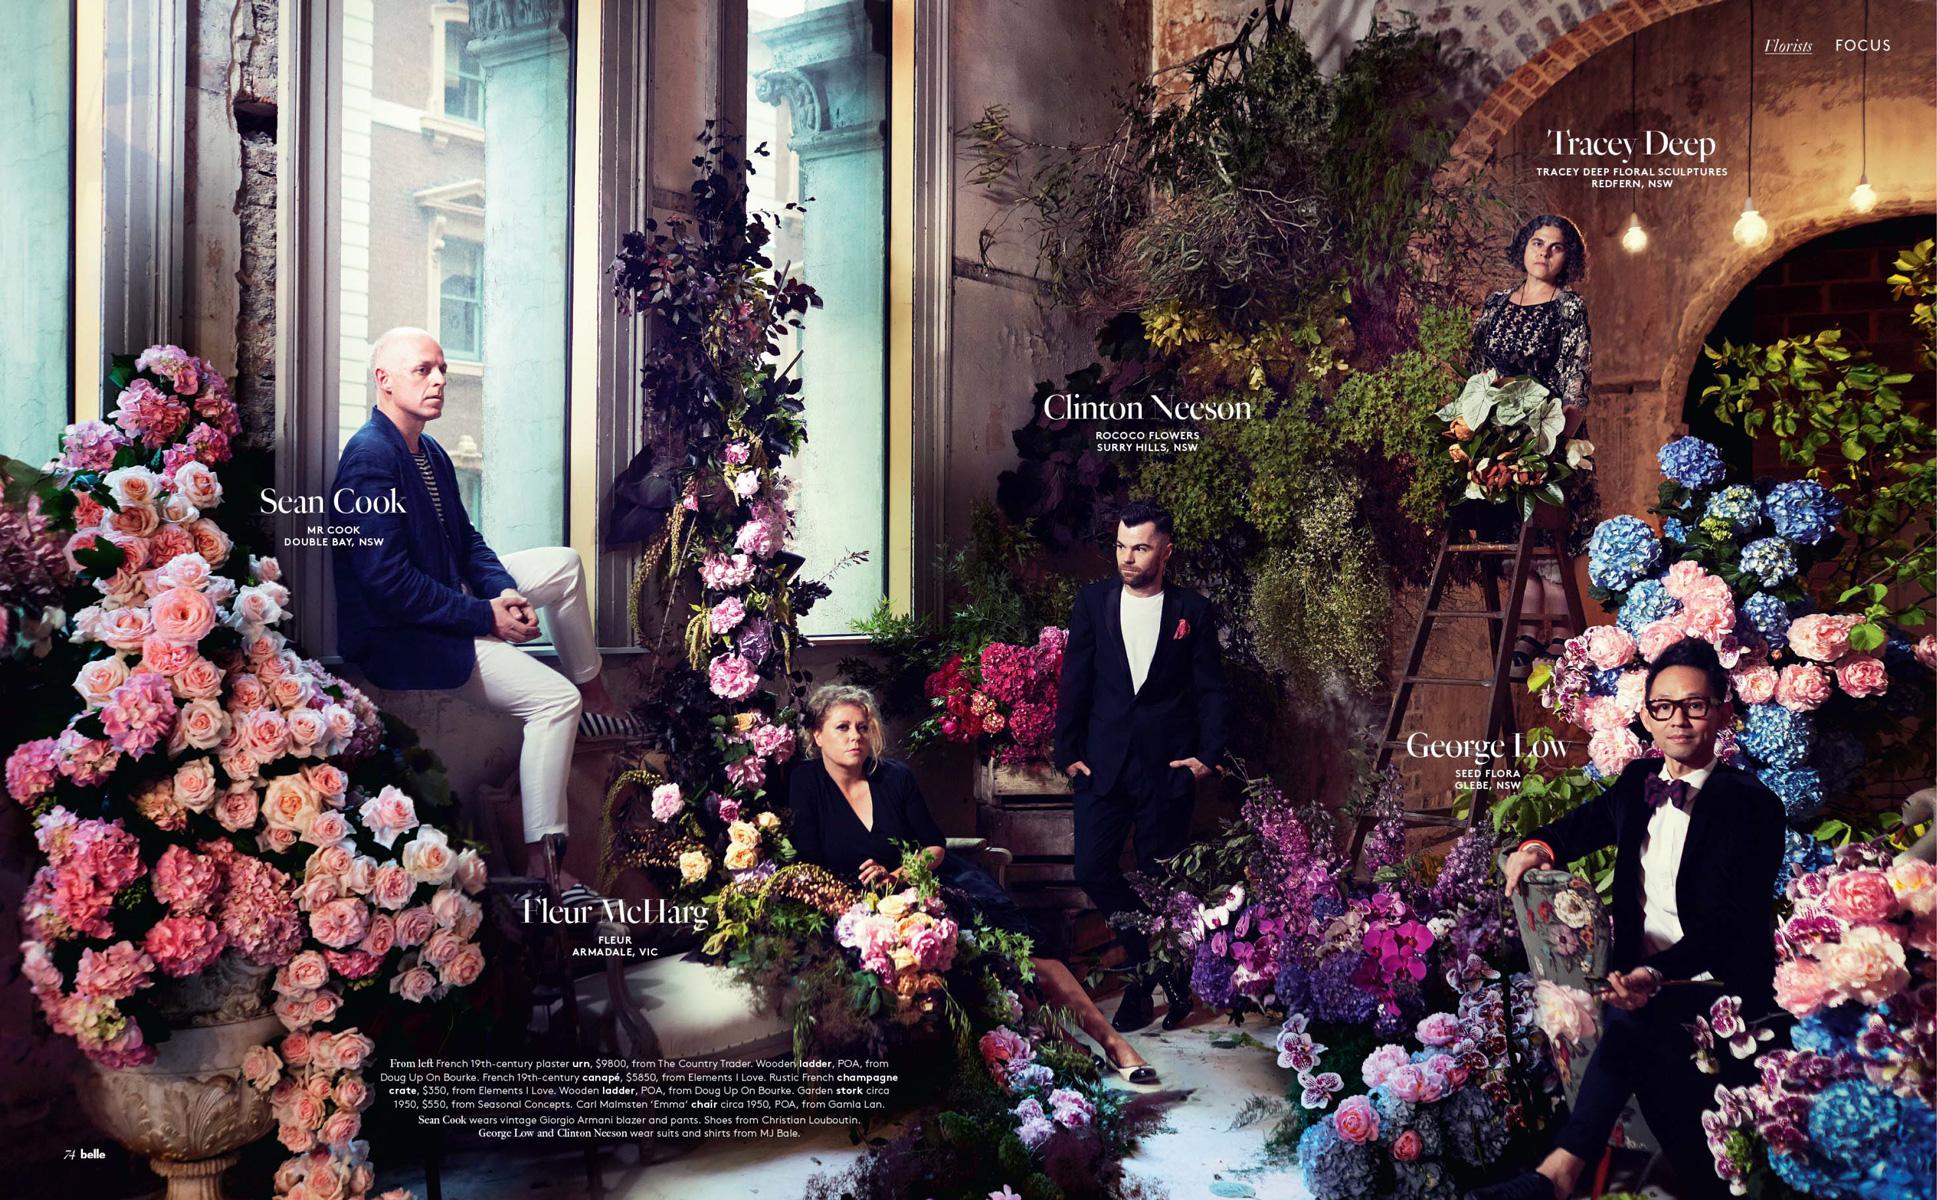 Belle-Feb-March-2014,-Florist-Focus-3.jpg